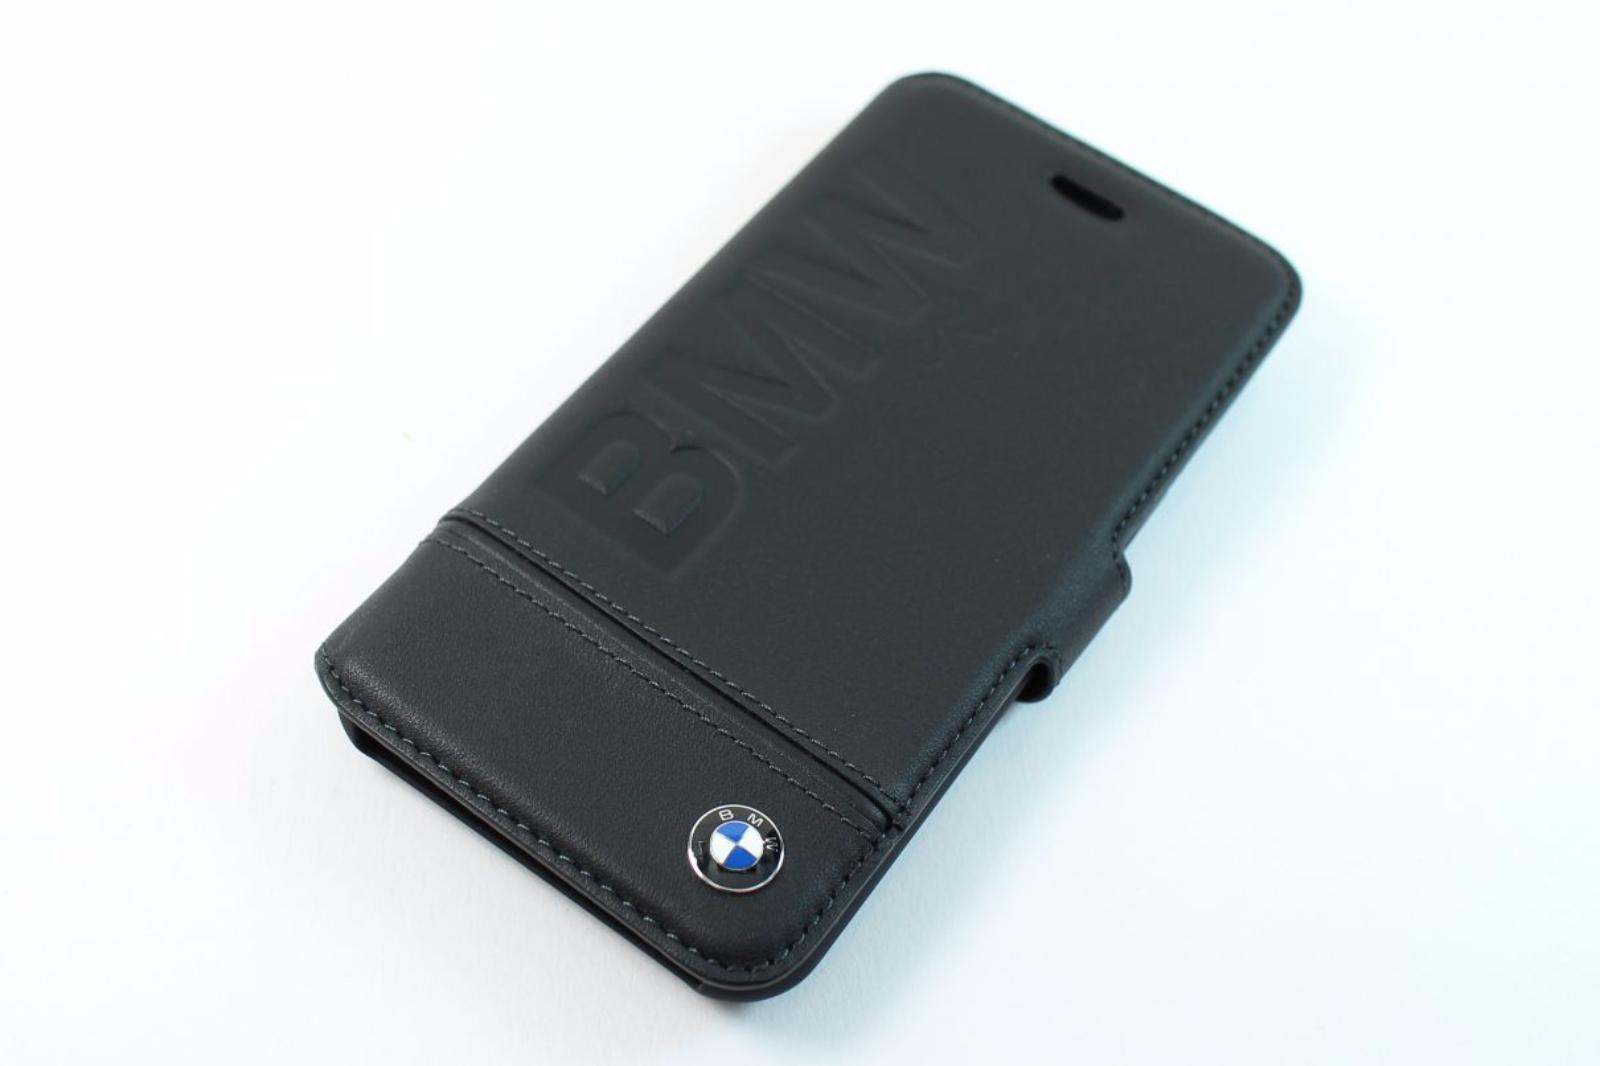 bmw signature booktype iphone 7 wallet case black leather. Black Bedroom Furniture Sets. Home Design Ideas